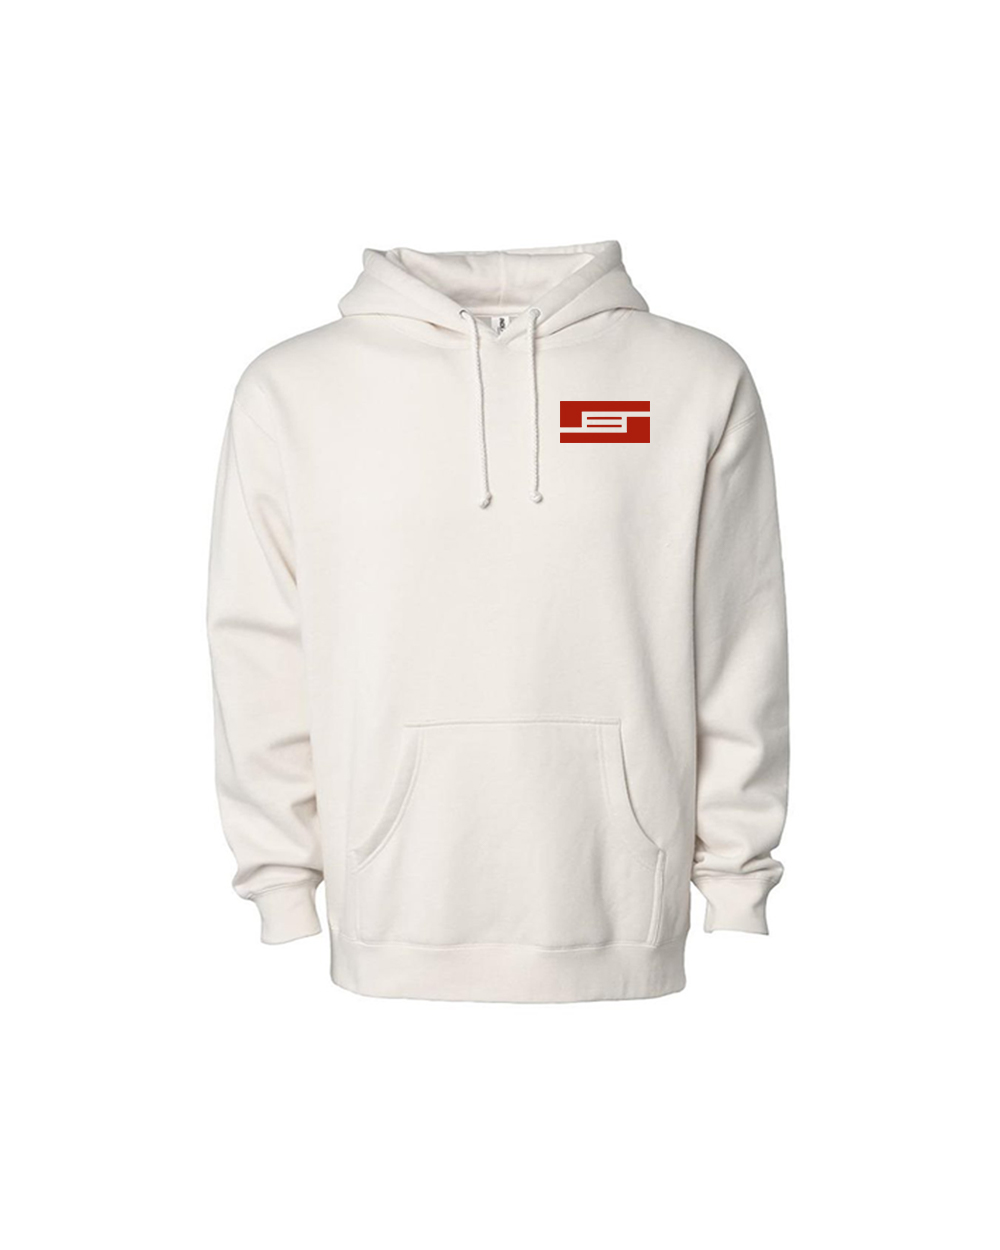 BYRD Pocket Logo White Hoodie